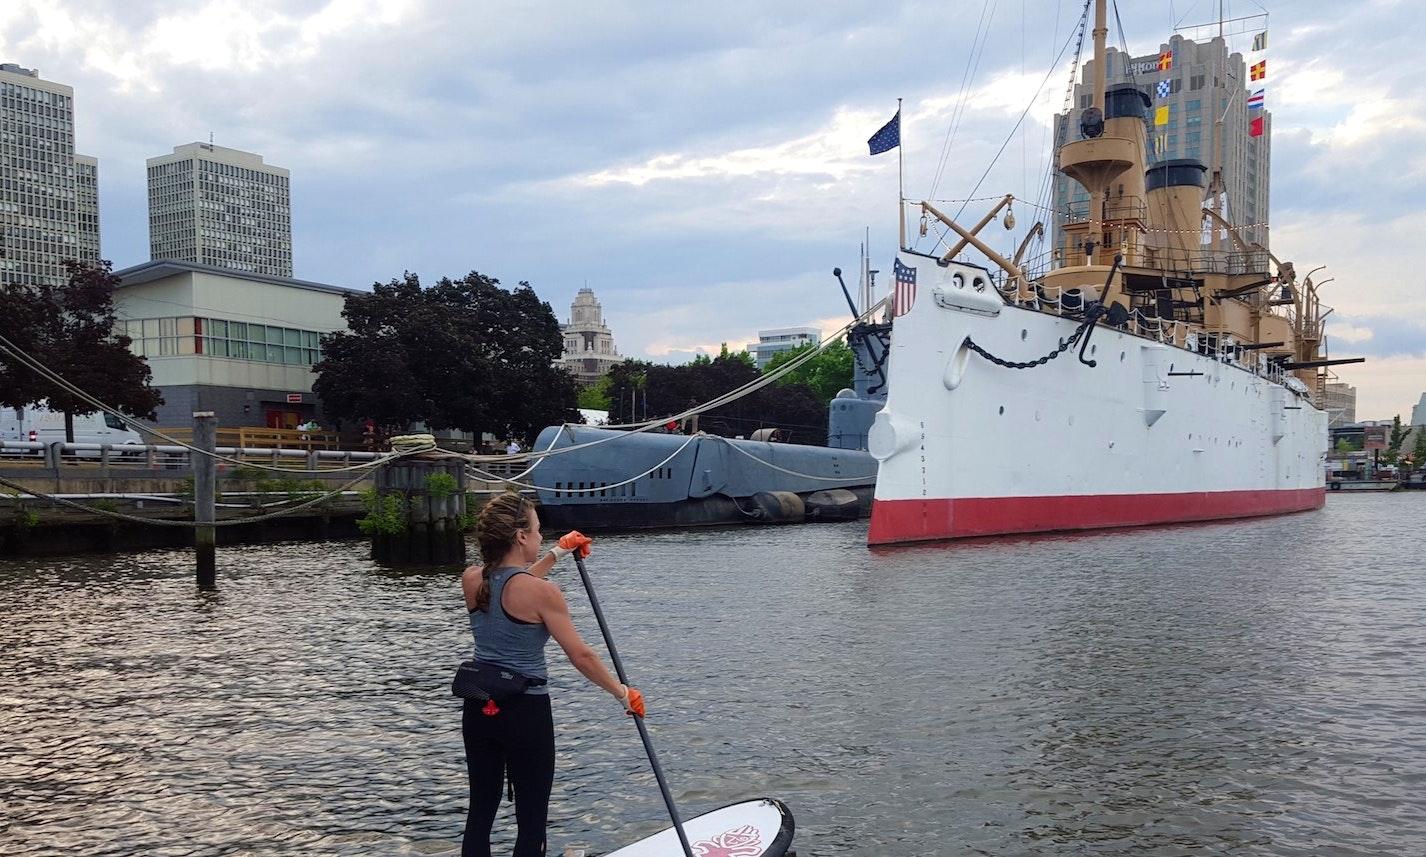 boat-rentals-philadelphia-pennsylvania-processed.jpg